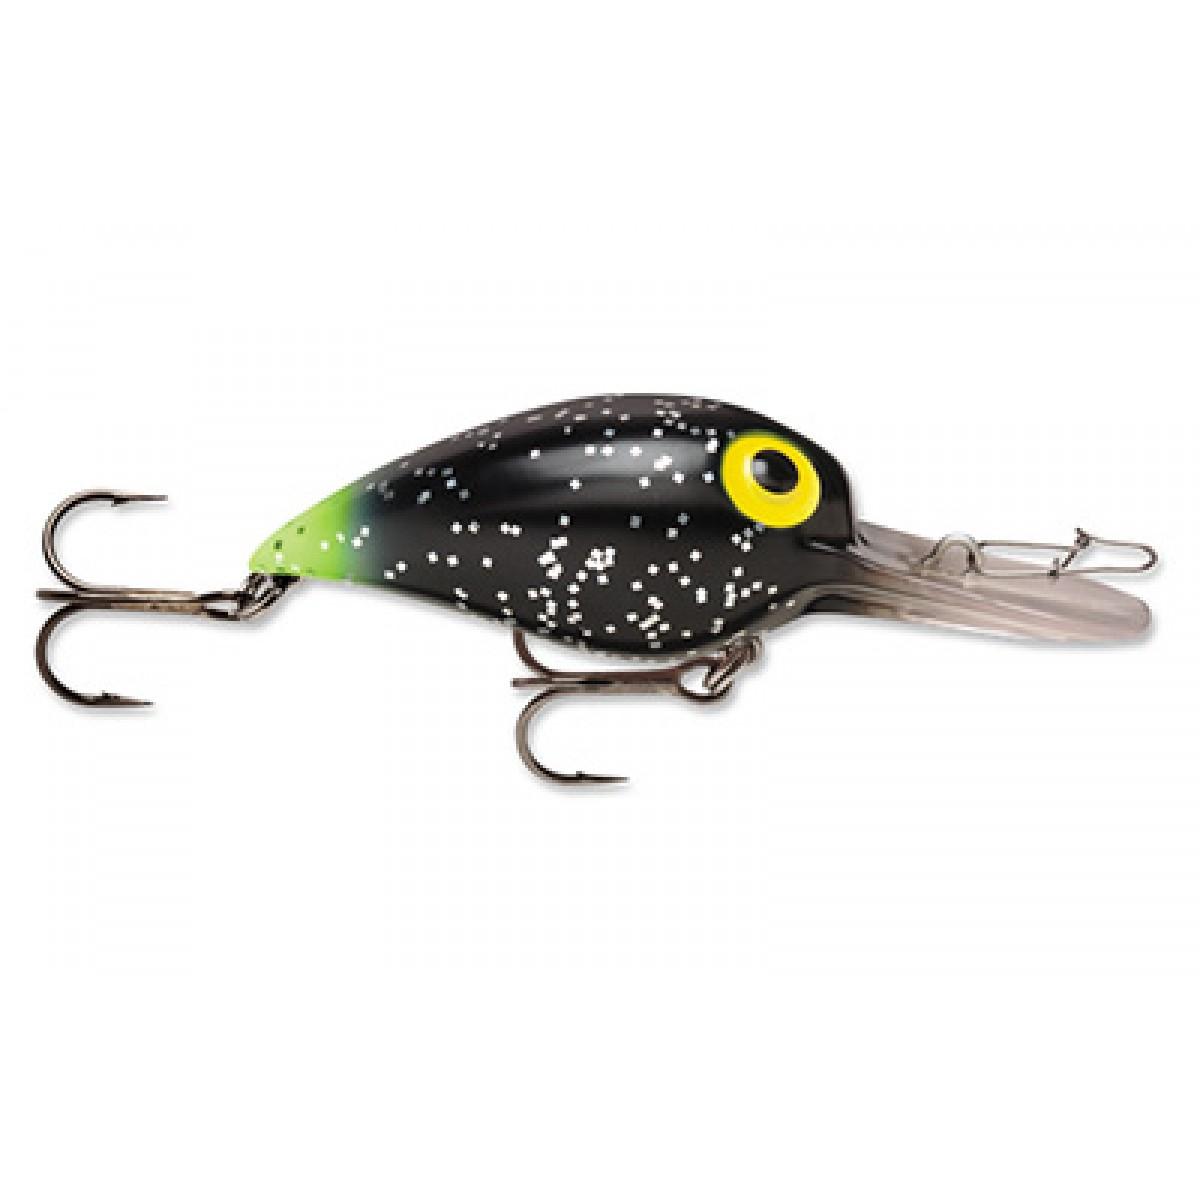 Storm Original Wiggle Wart Susquehanna Fishing Tackle